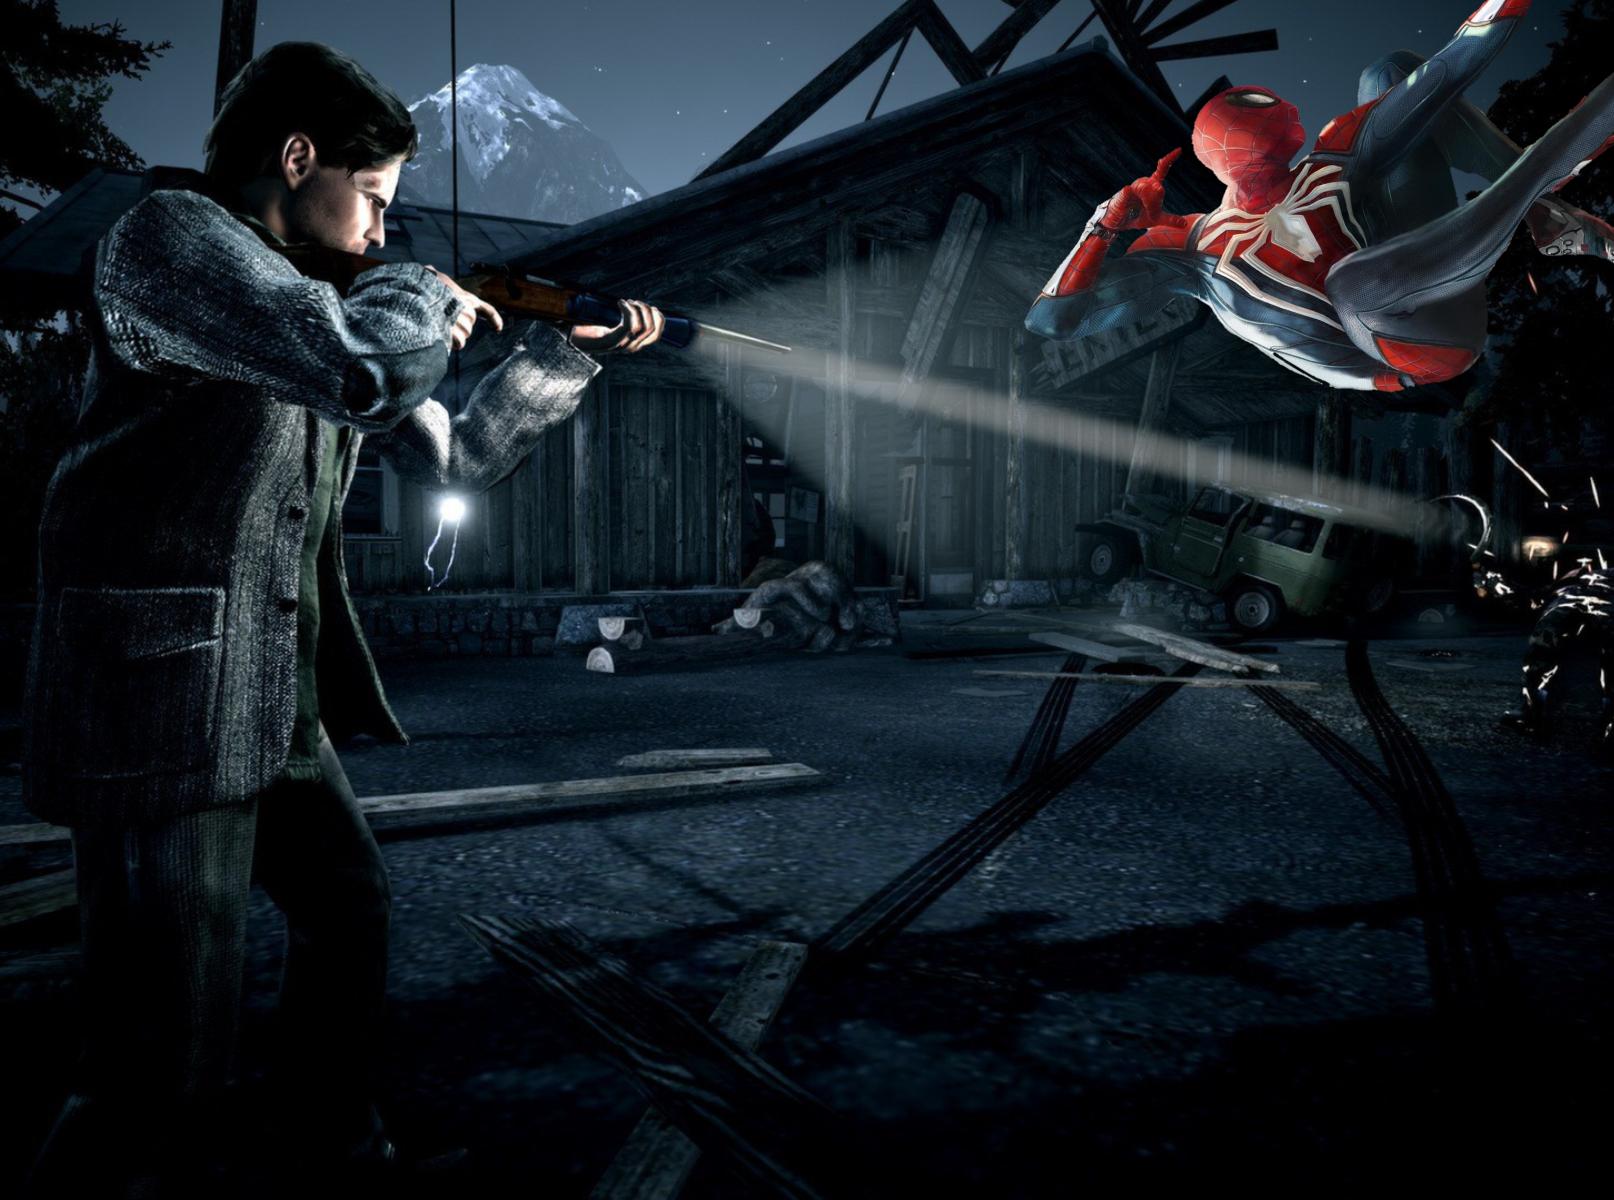 62 – Alan Wake / Spiderman